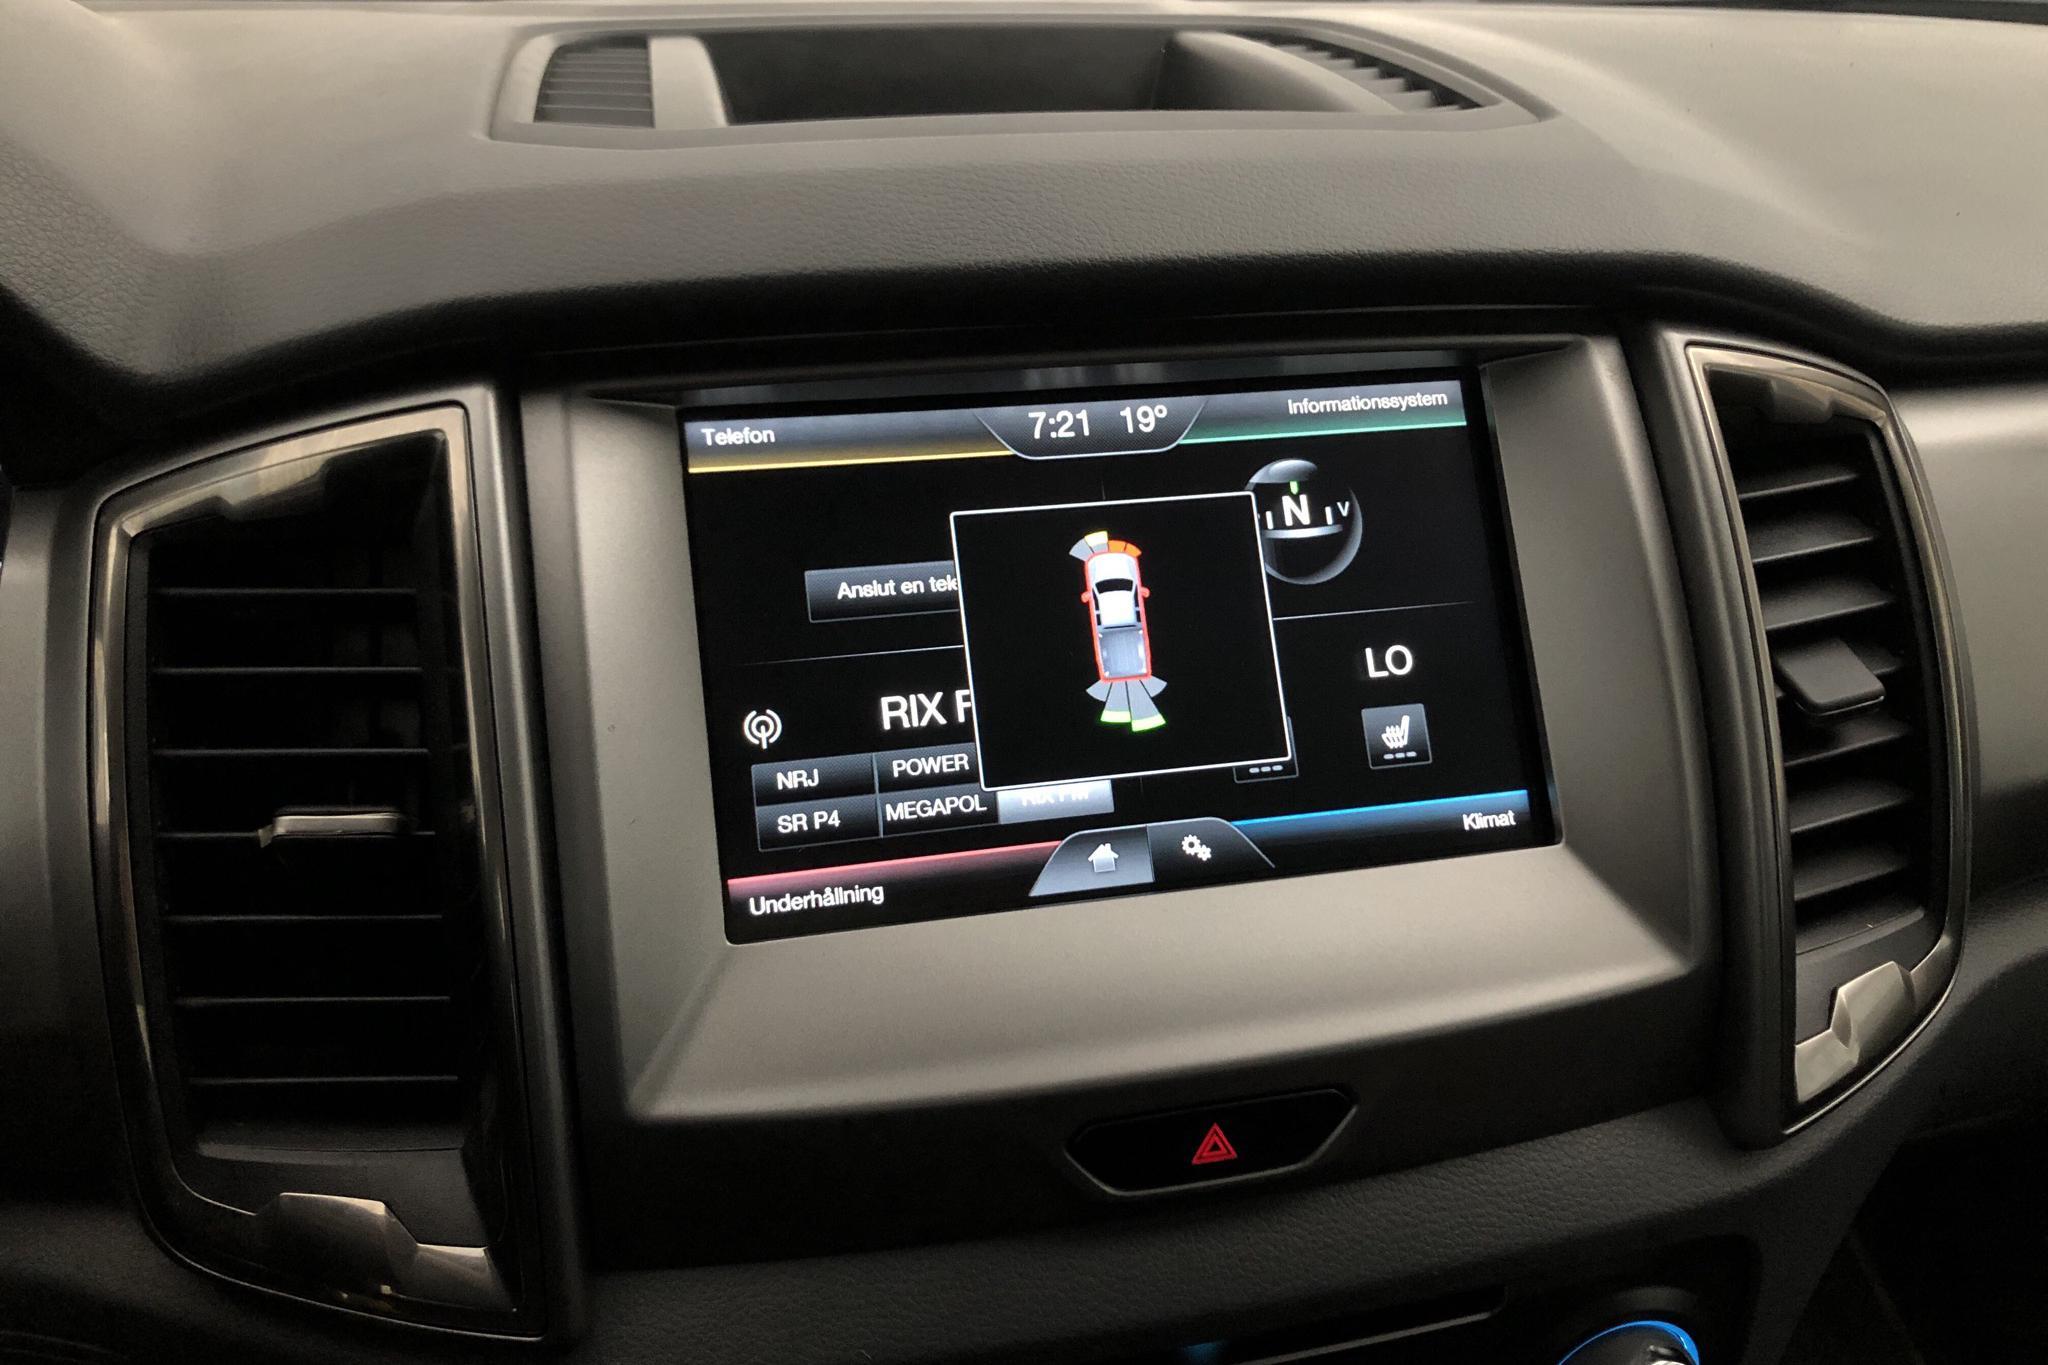 Ford Ranger 3.2 TDCi 4WD (200hk) - 12 418 mil - Automat - vit - 2016